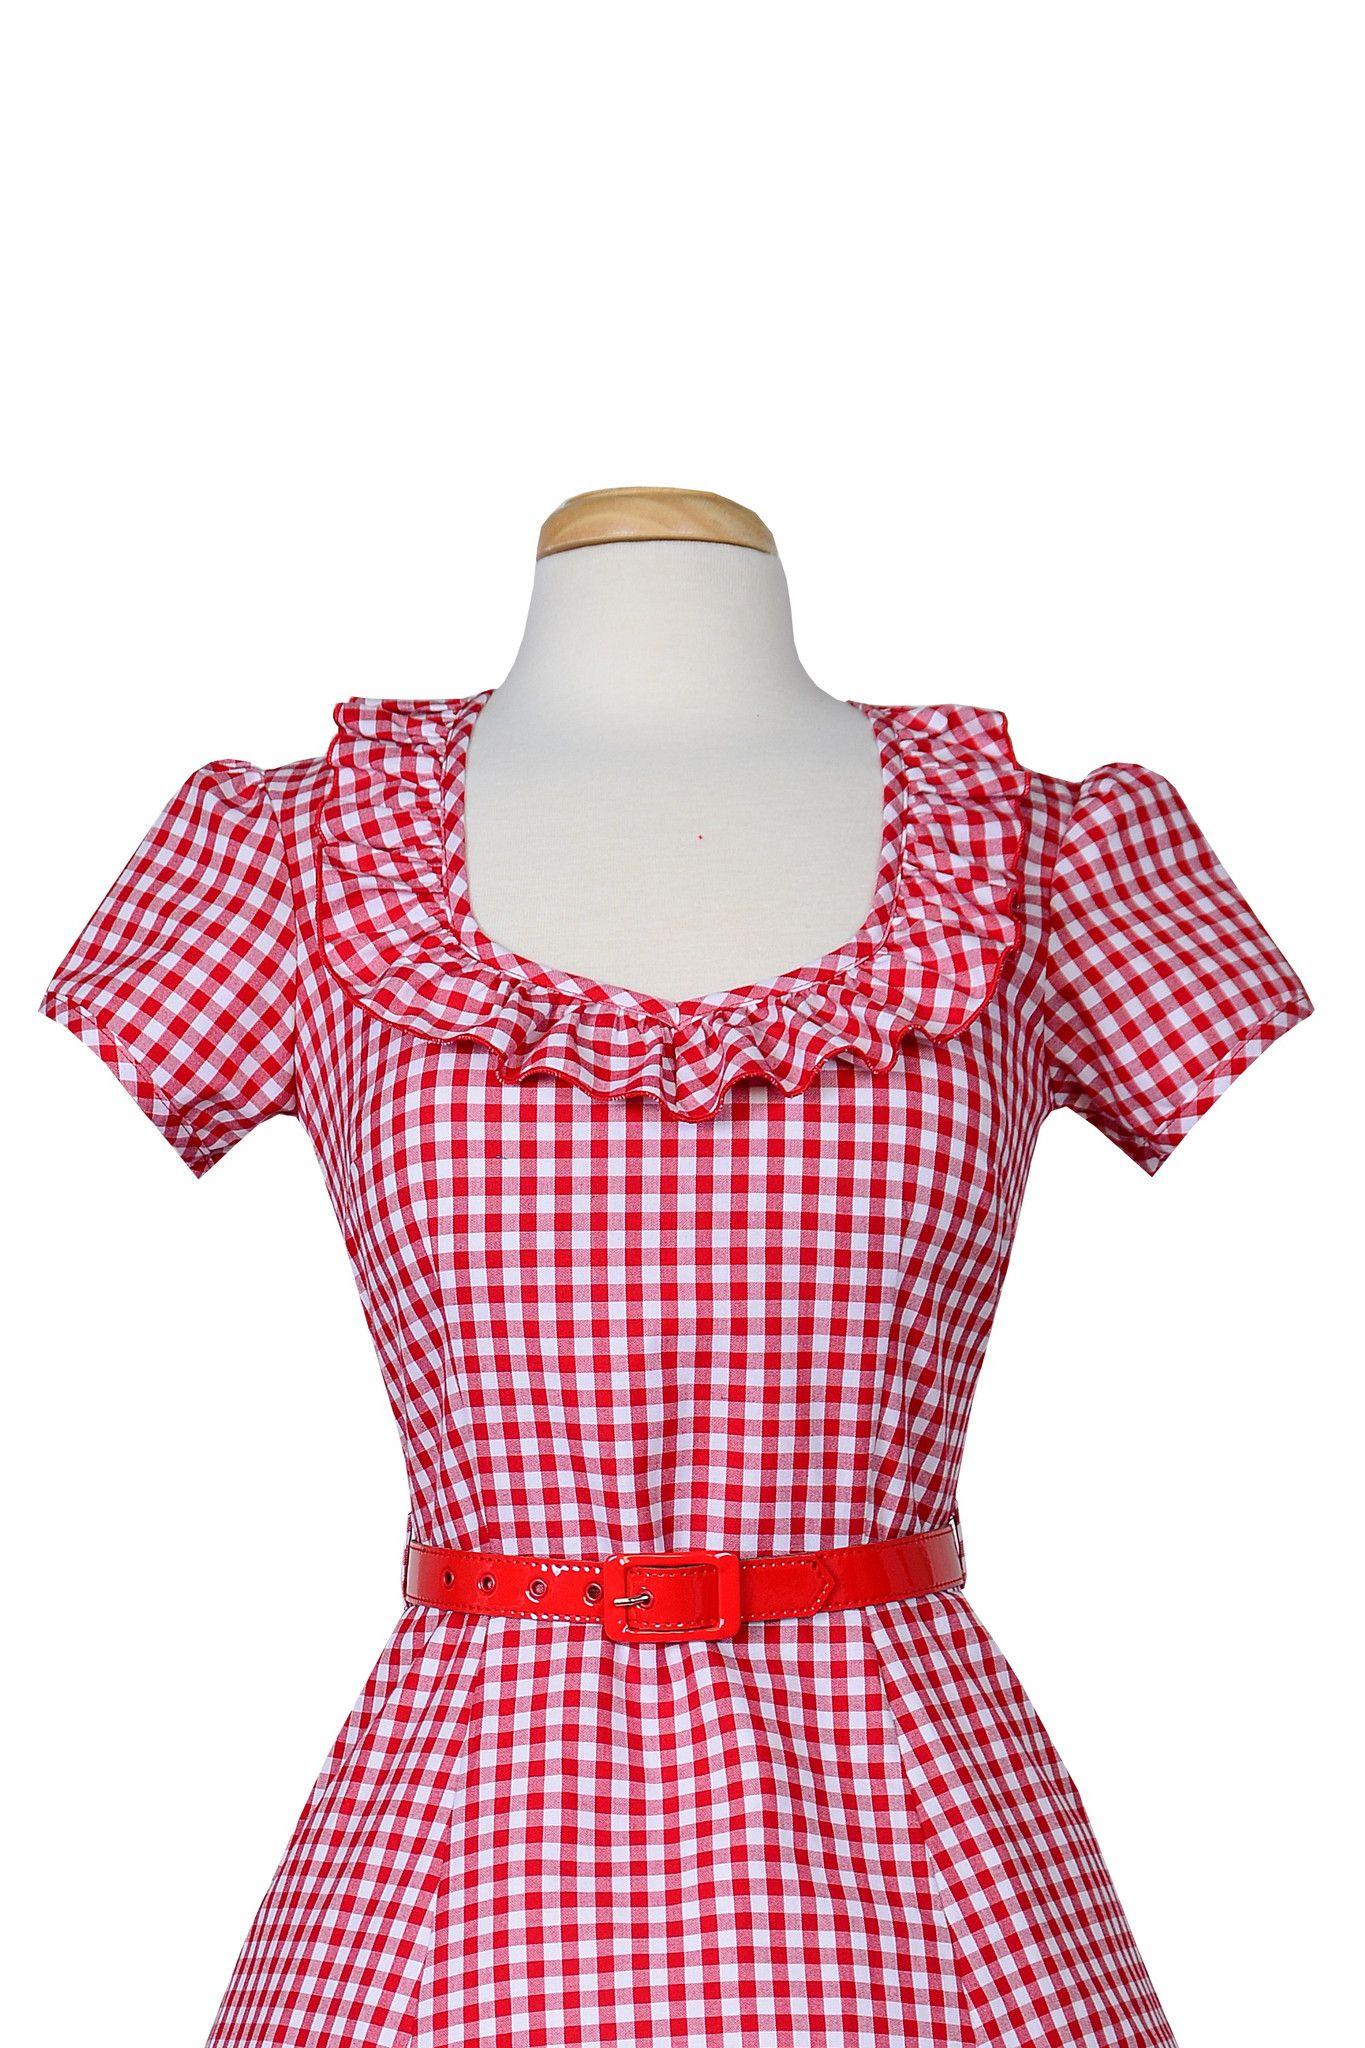 Ebury Dress in Red Gingham - Bernie Dexter